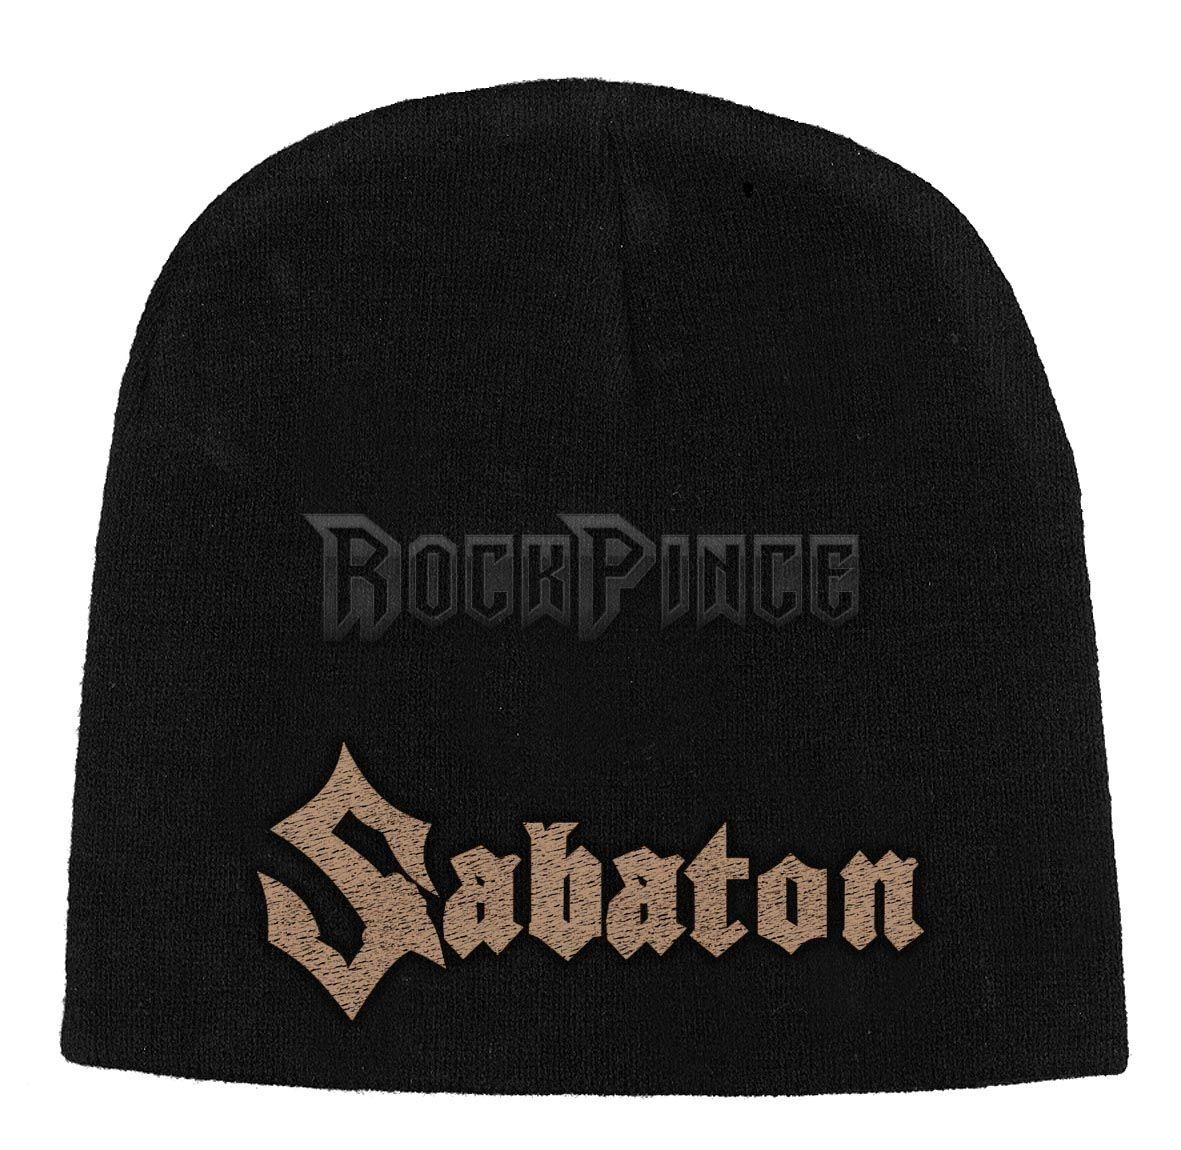 Sabaton 'Logo' beanie sapka - BH092